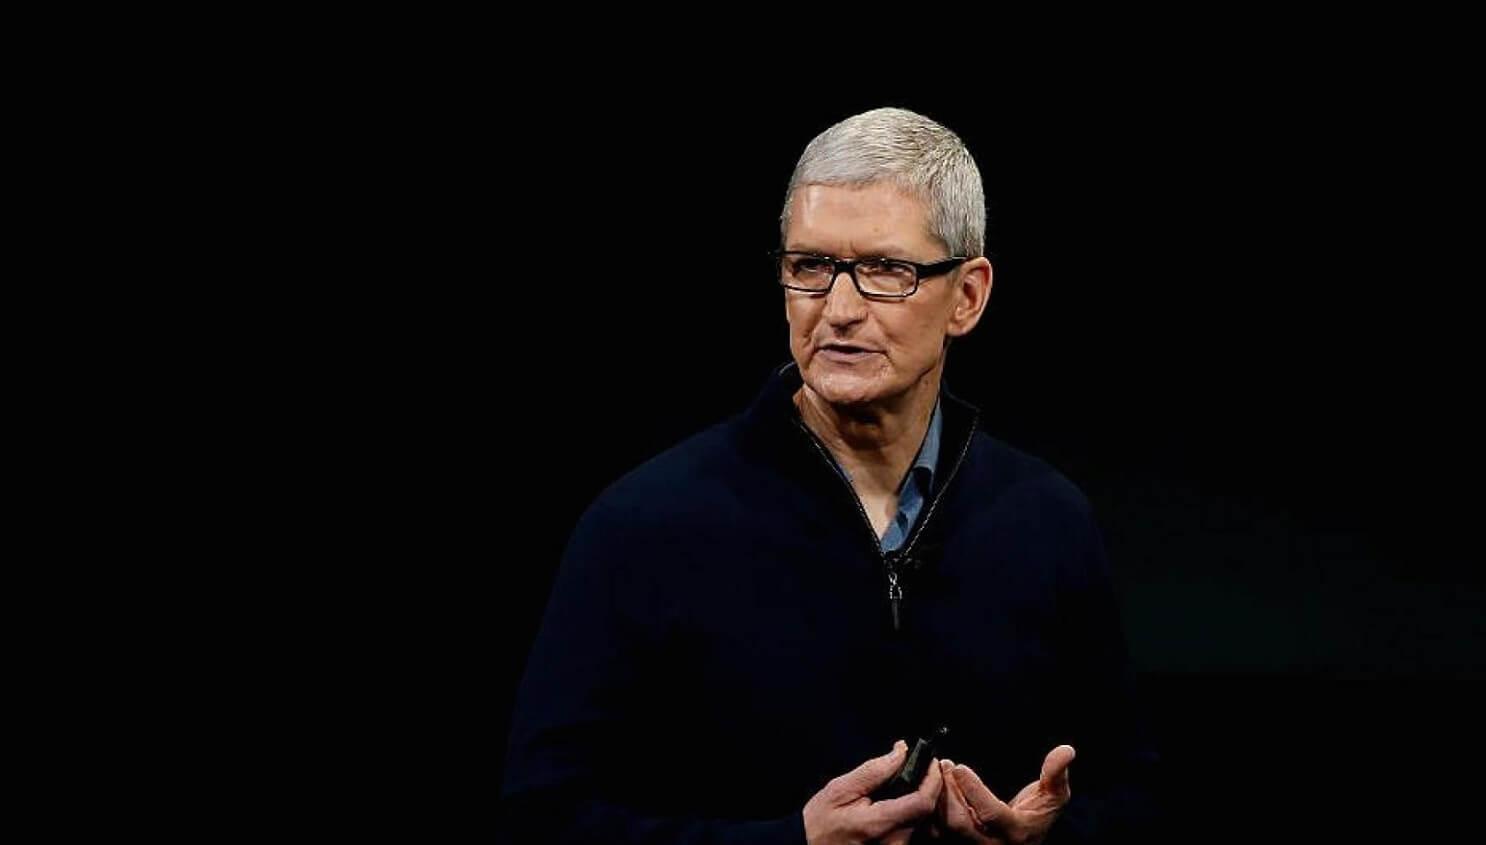 tim cook apple facebook trillion